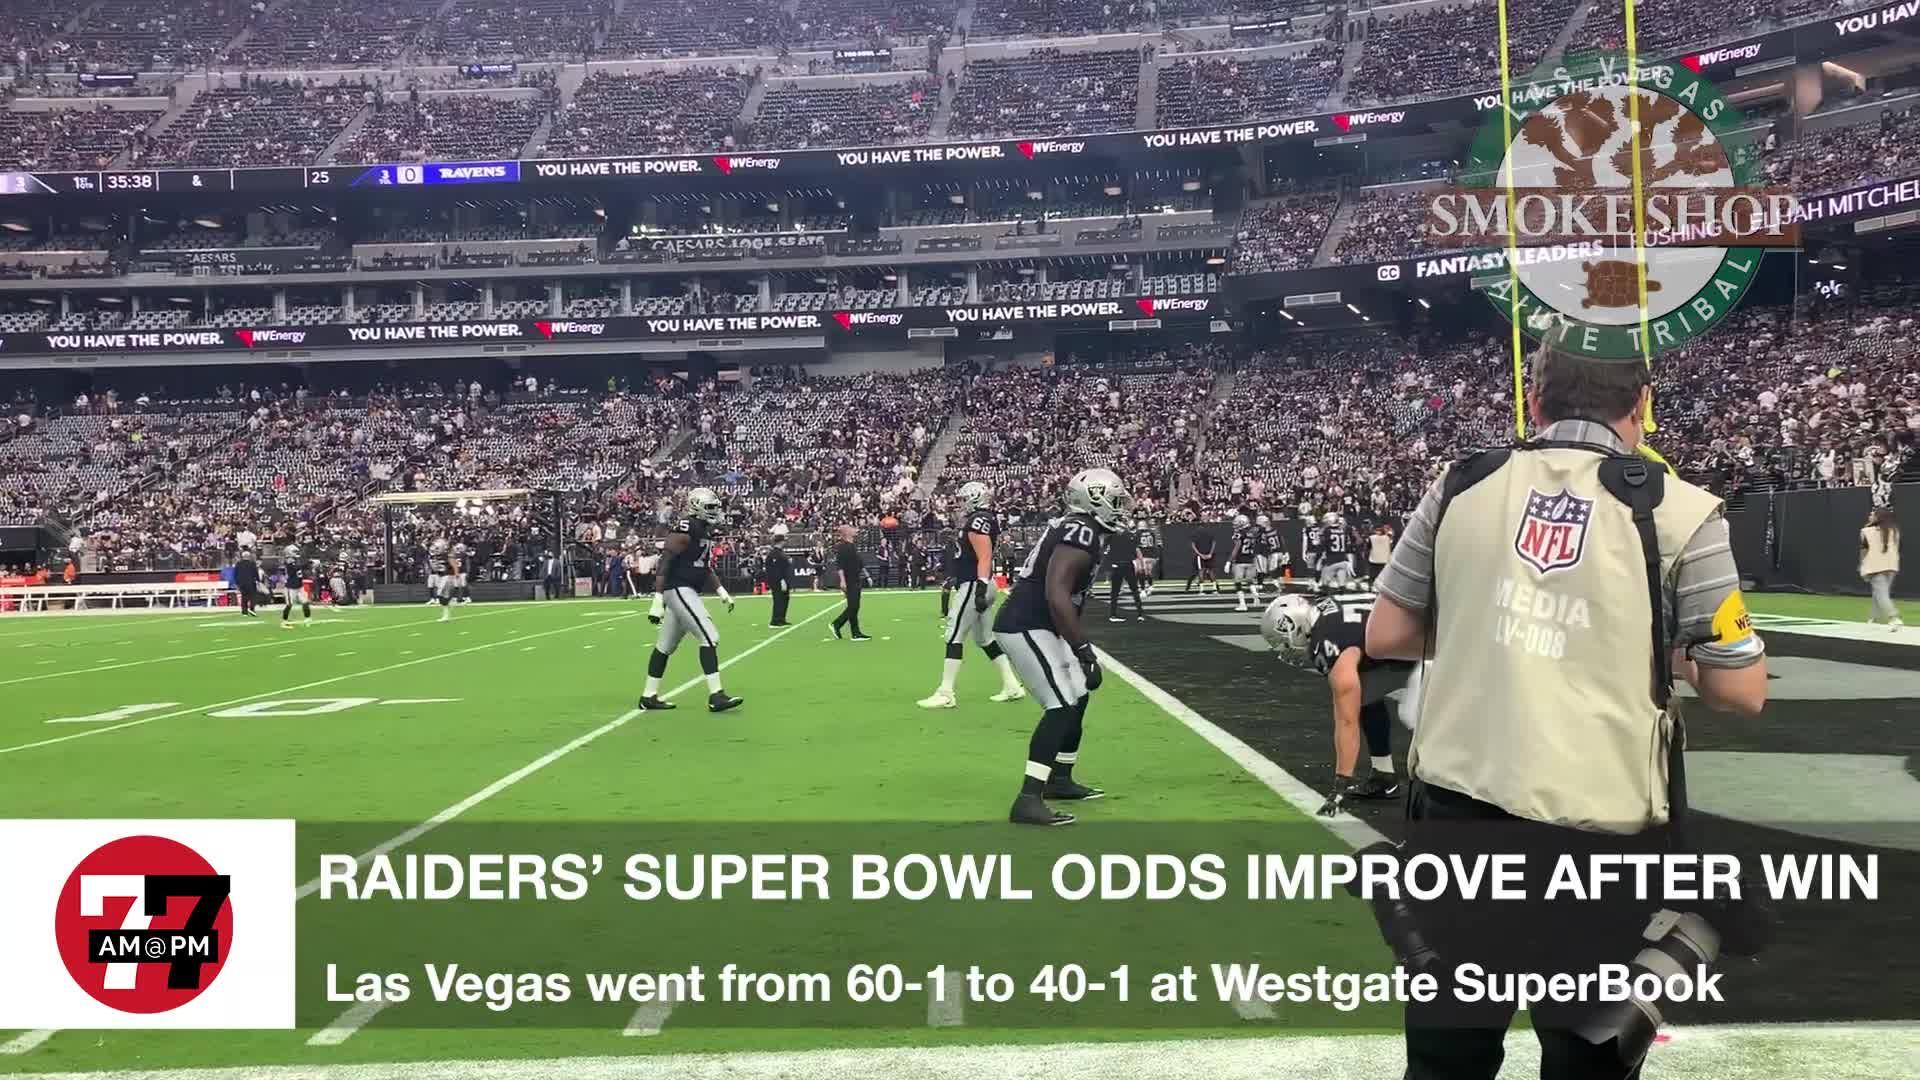 7@7PM Raiders Super Bowl Odds Raise